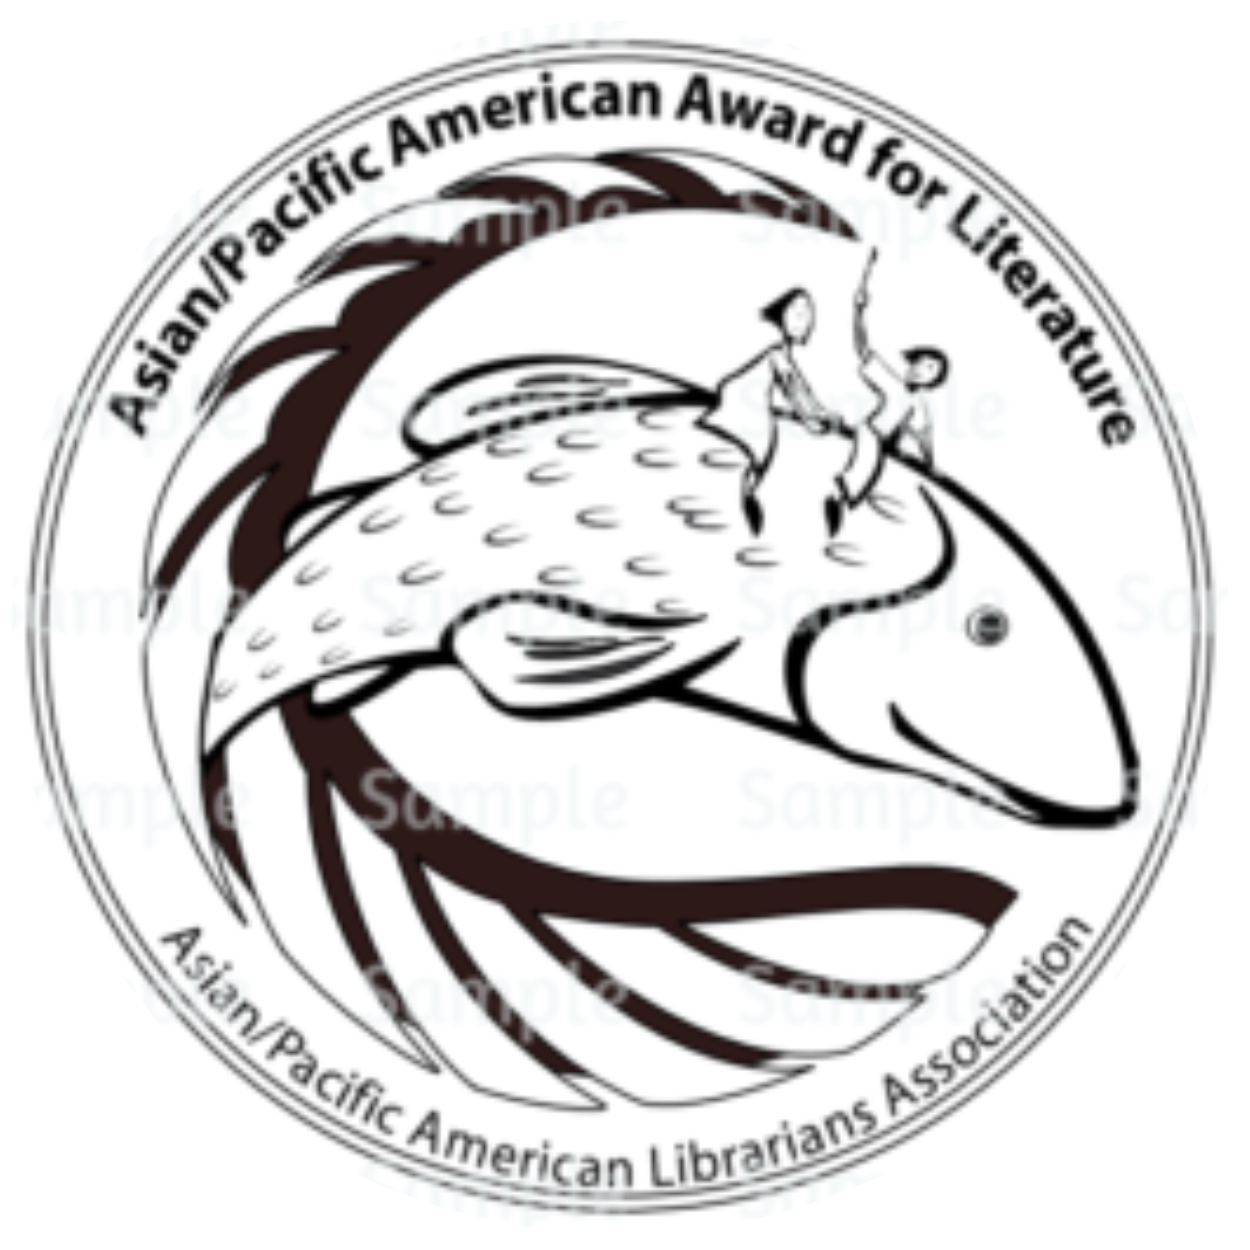 Asian Pacific Award.png